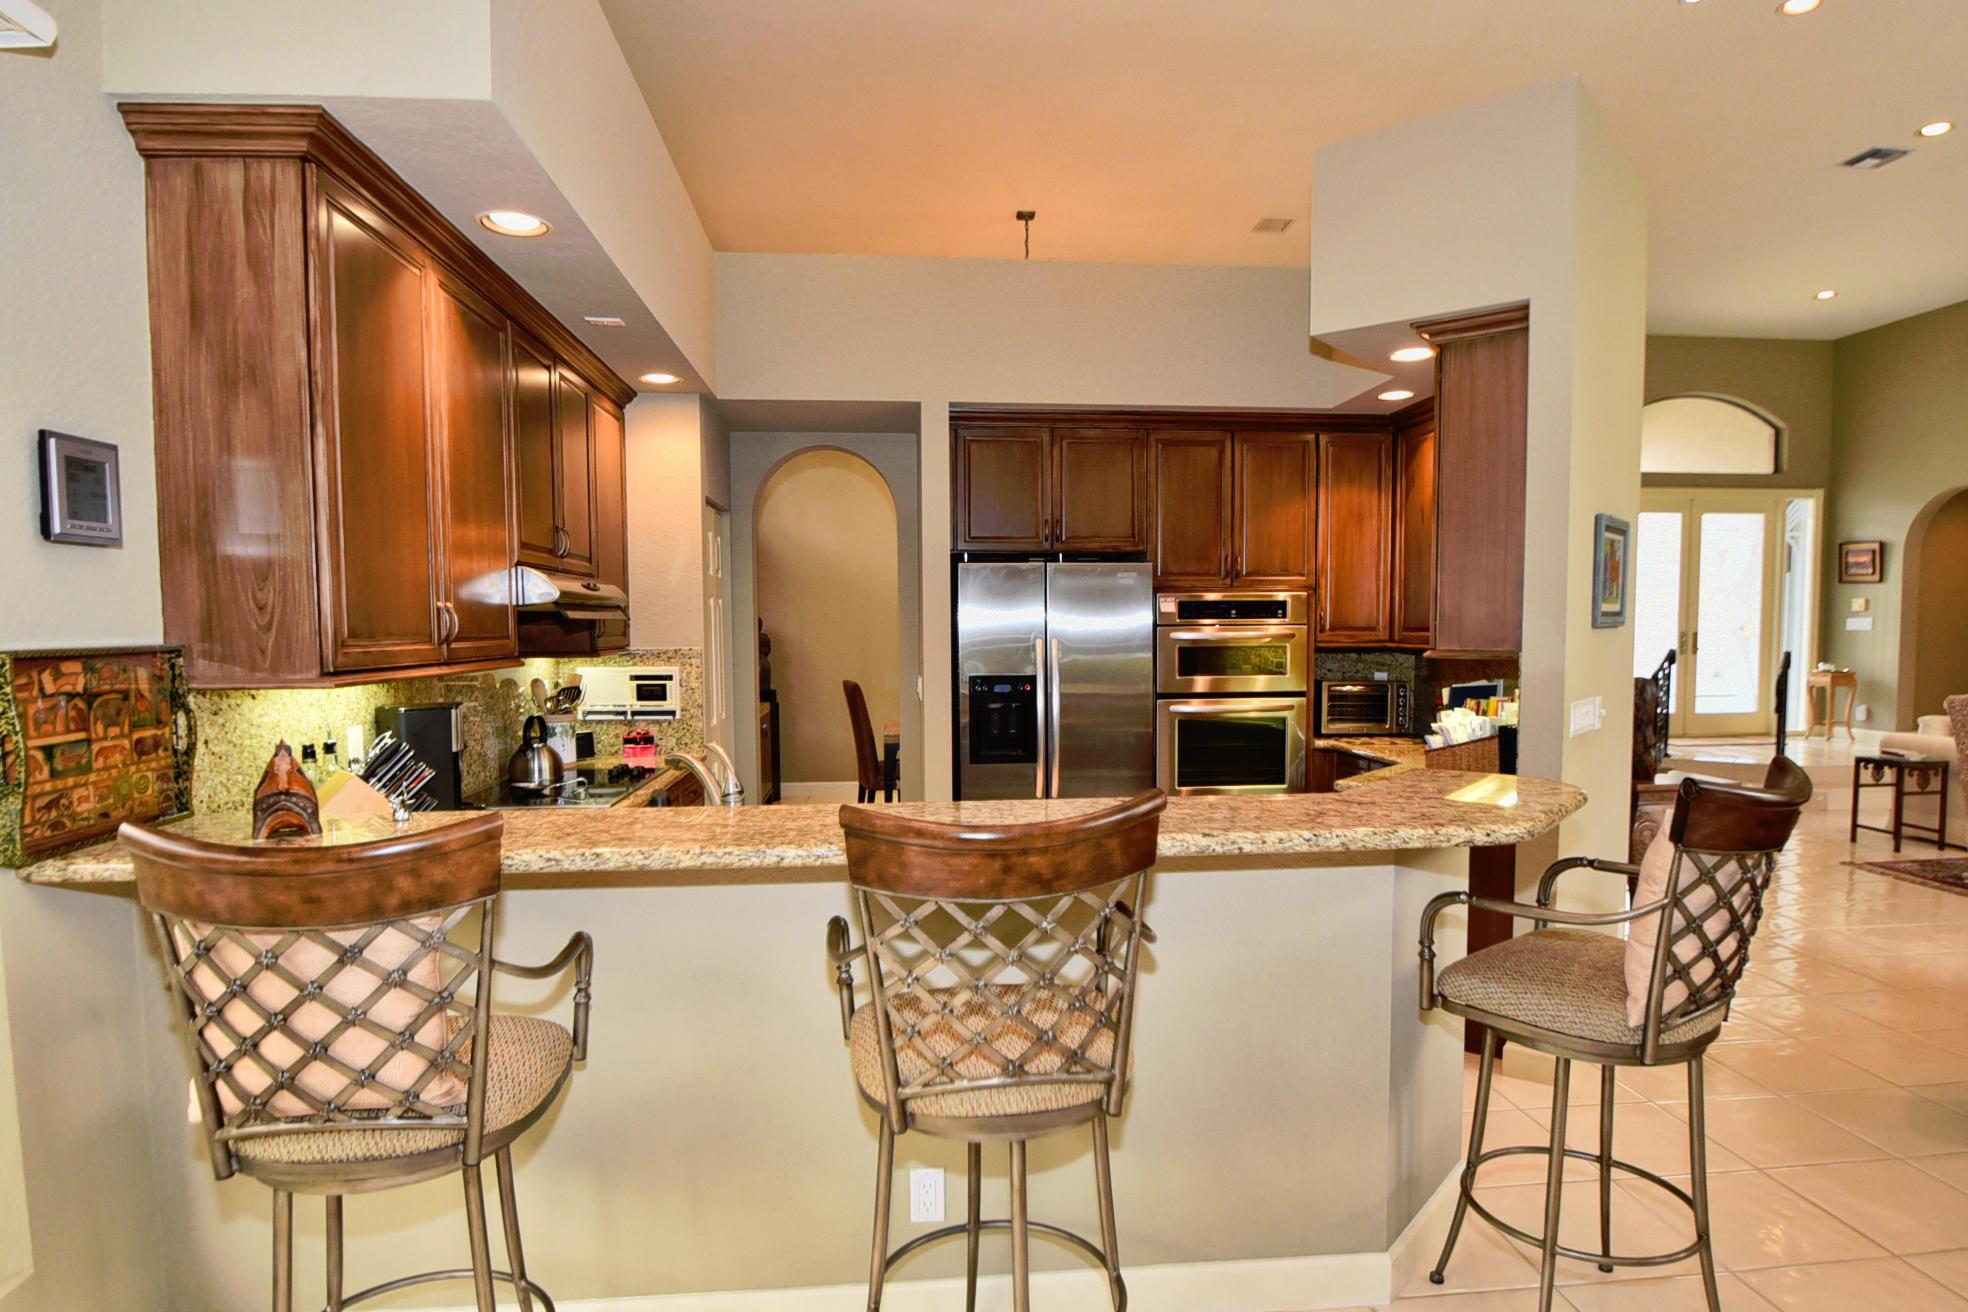 2513 59th Street, Boca Raton, Florida 33496, 3 Bedrooms Bedrooms, ,3.1 BathroomsBathrooms,Single Family,For Sale,Broken Sound,59th,RX-10463755